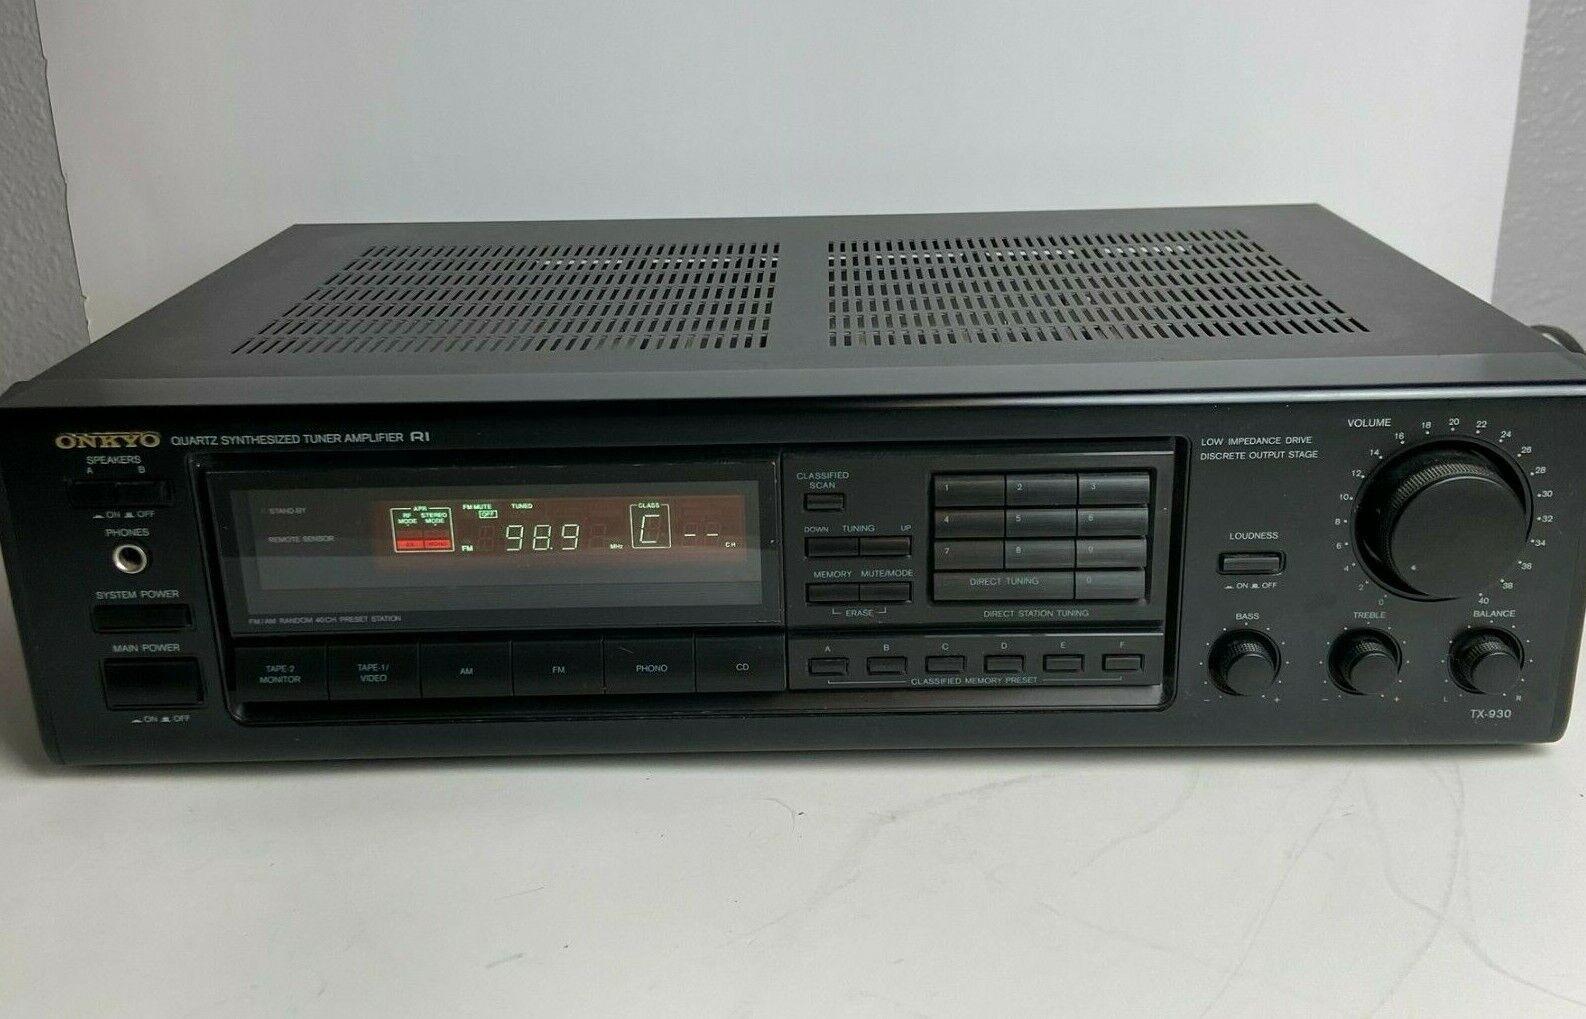 Onkyo TX-930 Phono Input Quartz Synthesized AM/FM Tuner Receiver - Tested - $64.77